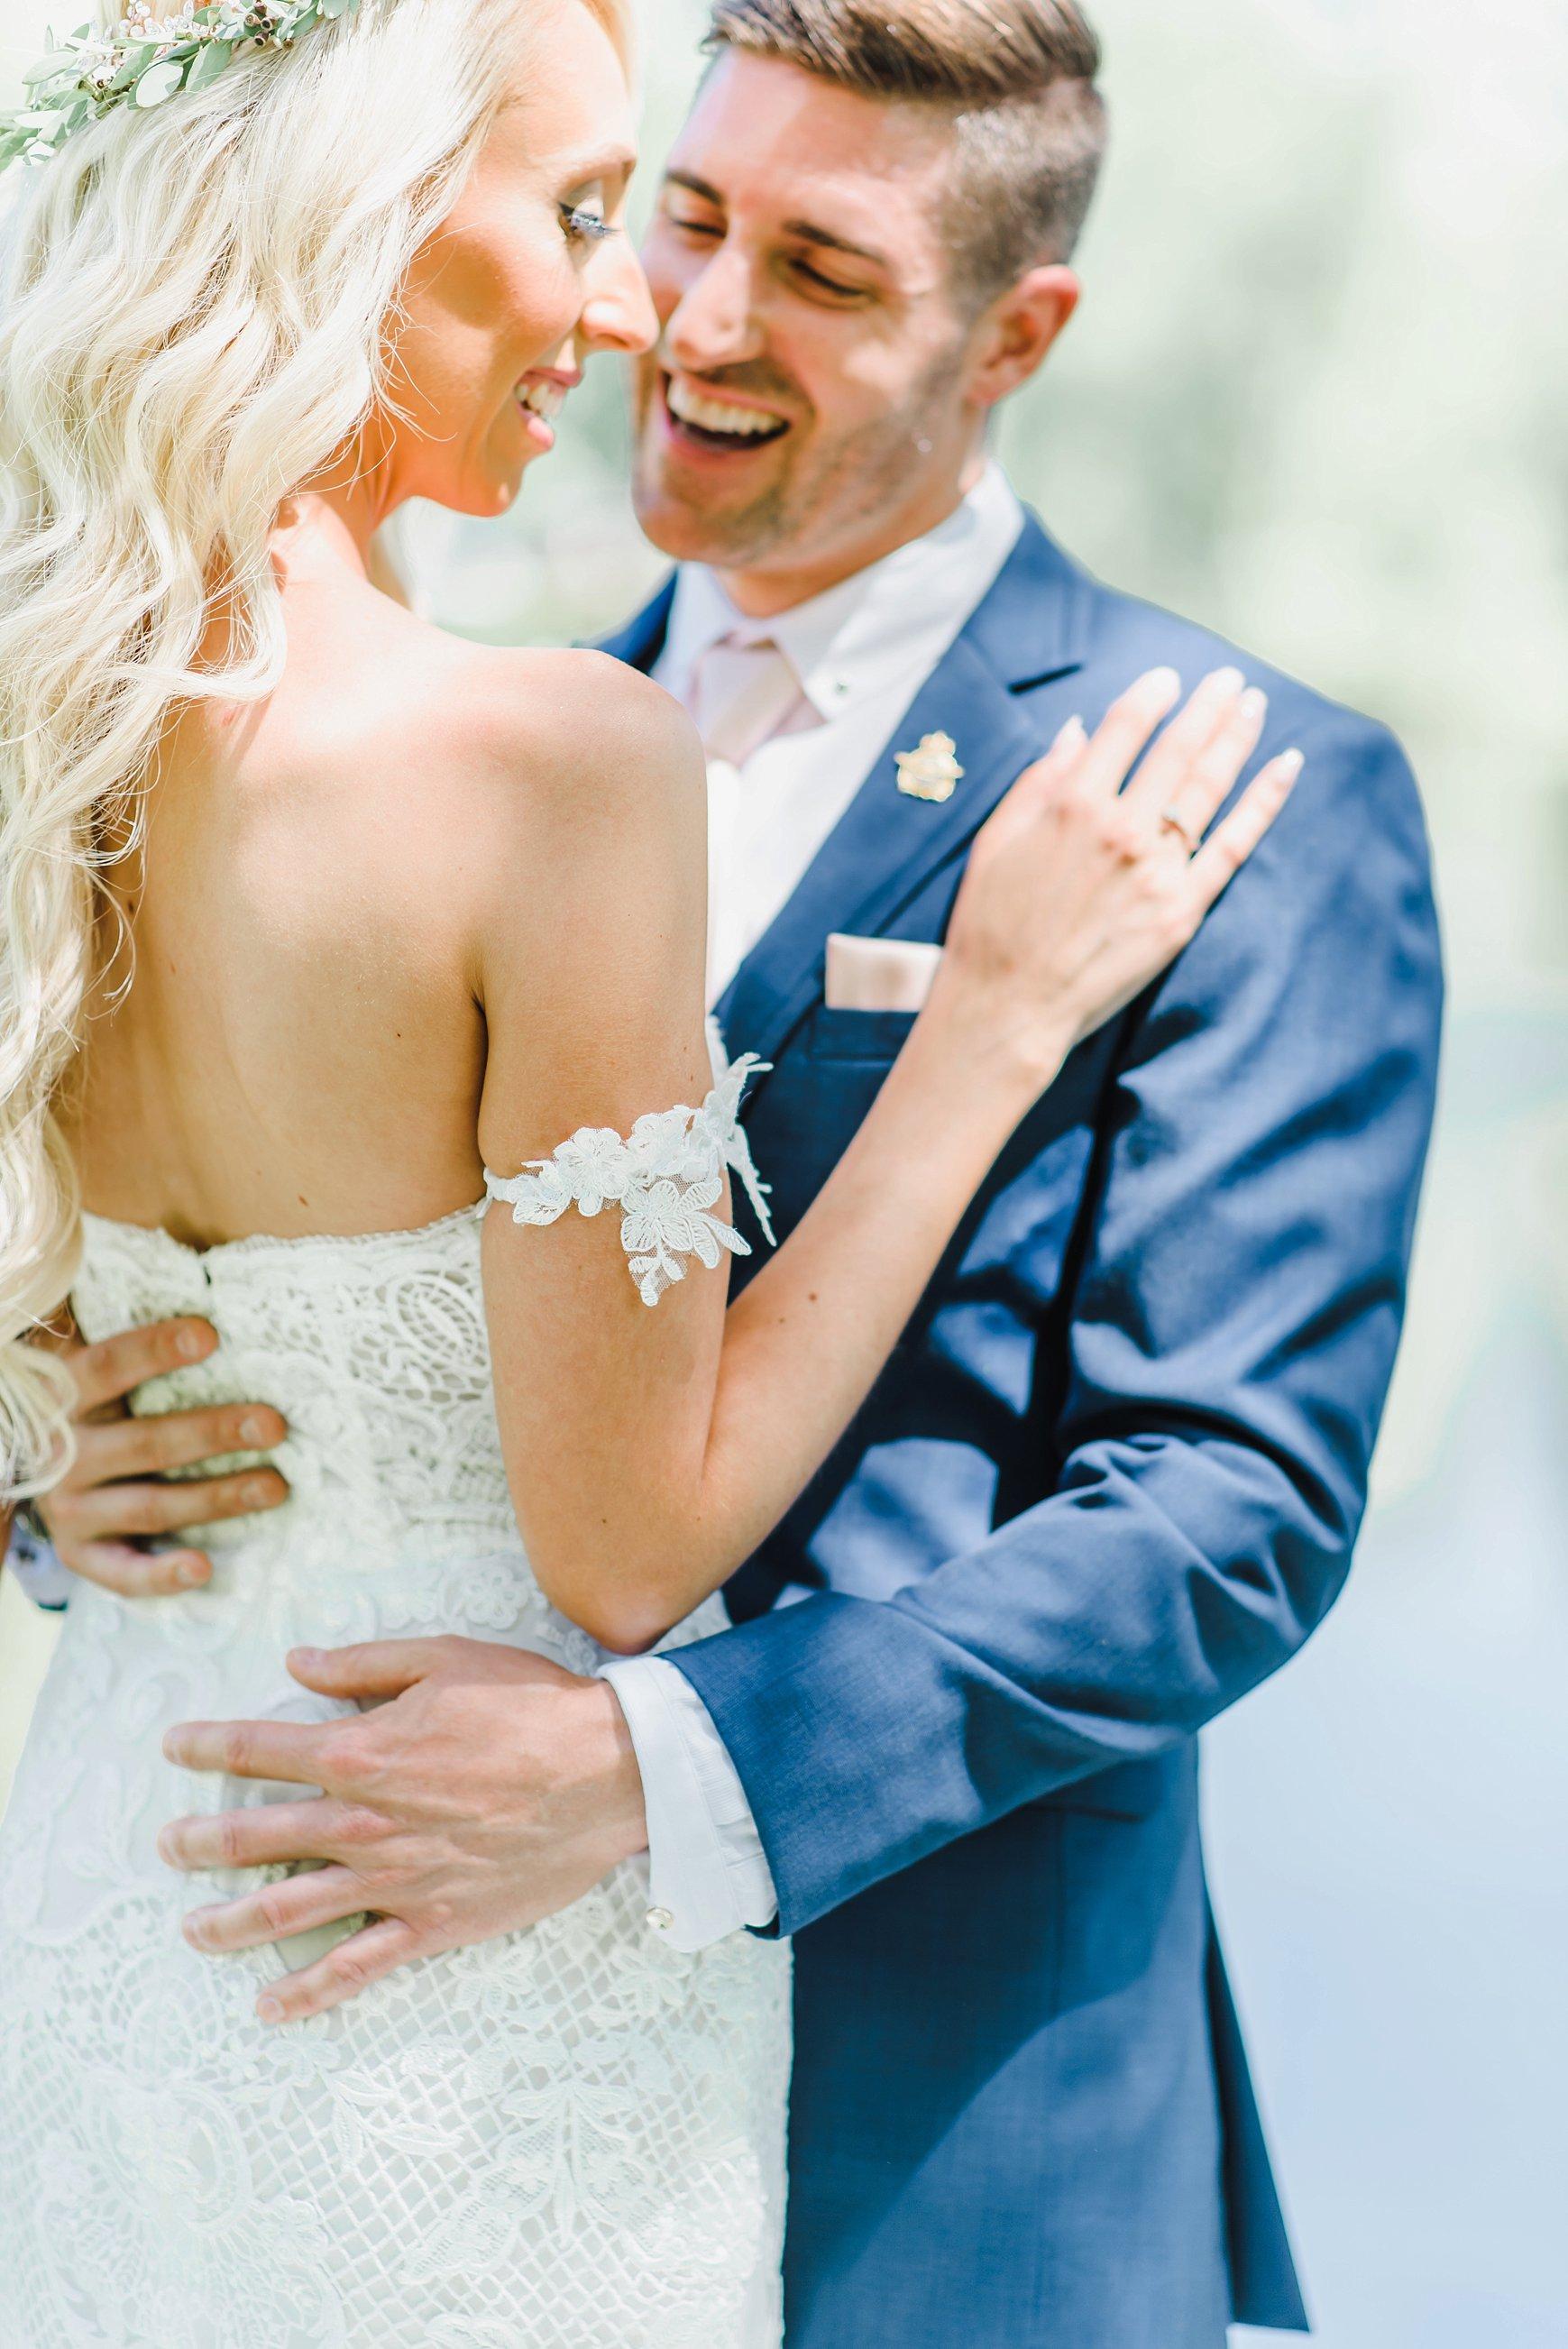 light airy indie fine art ottawa wedding photographer | Ali and Batoul Photography_0035.jpg